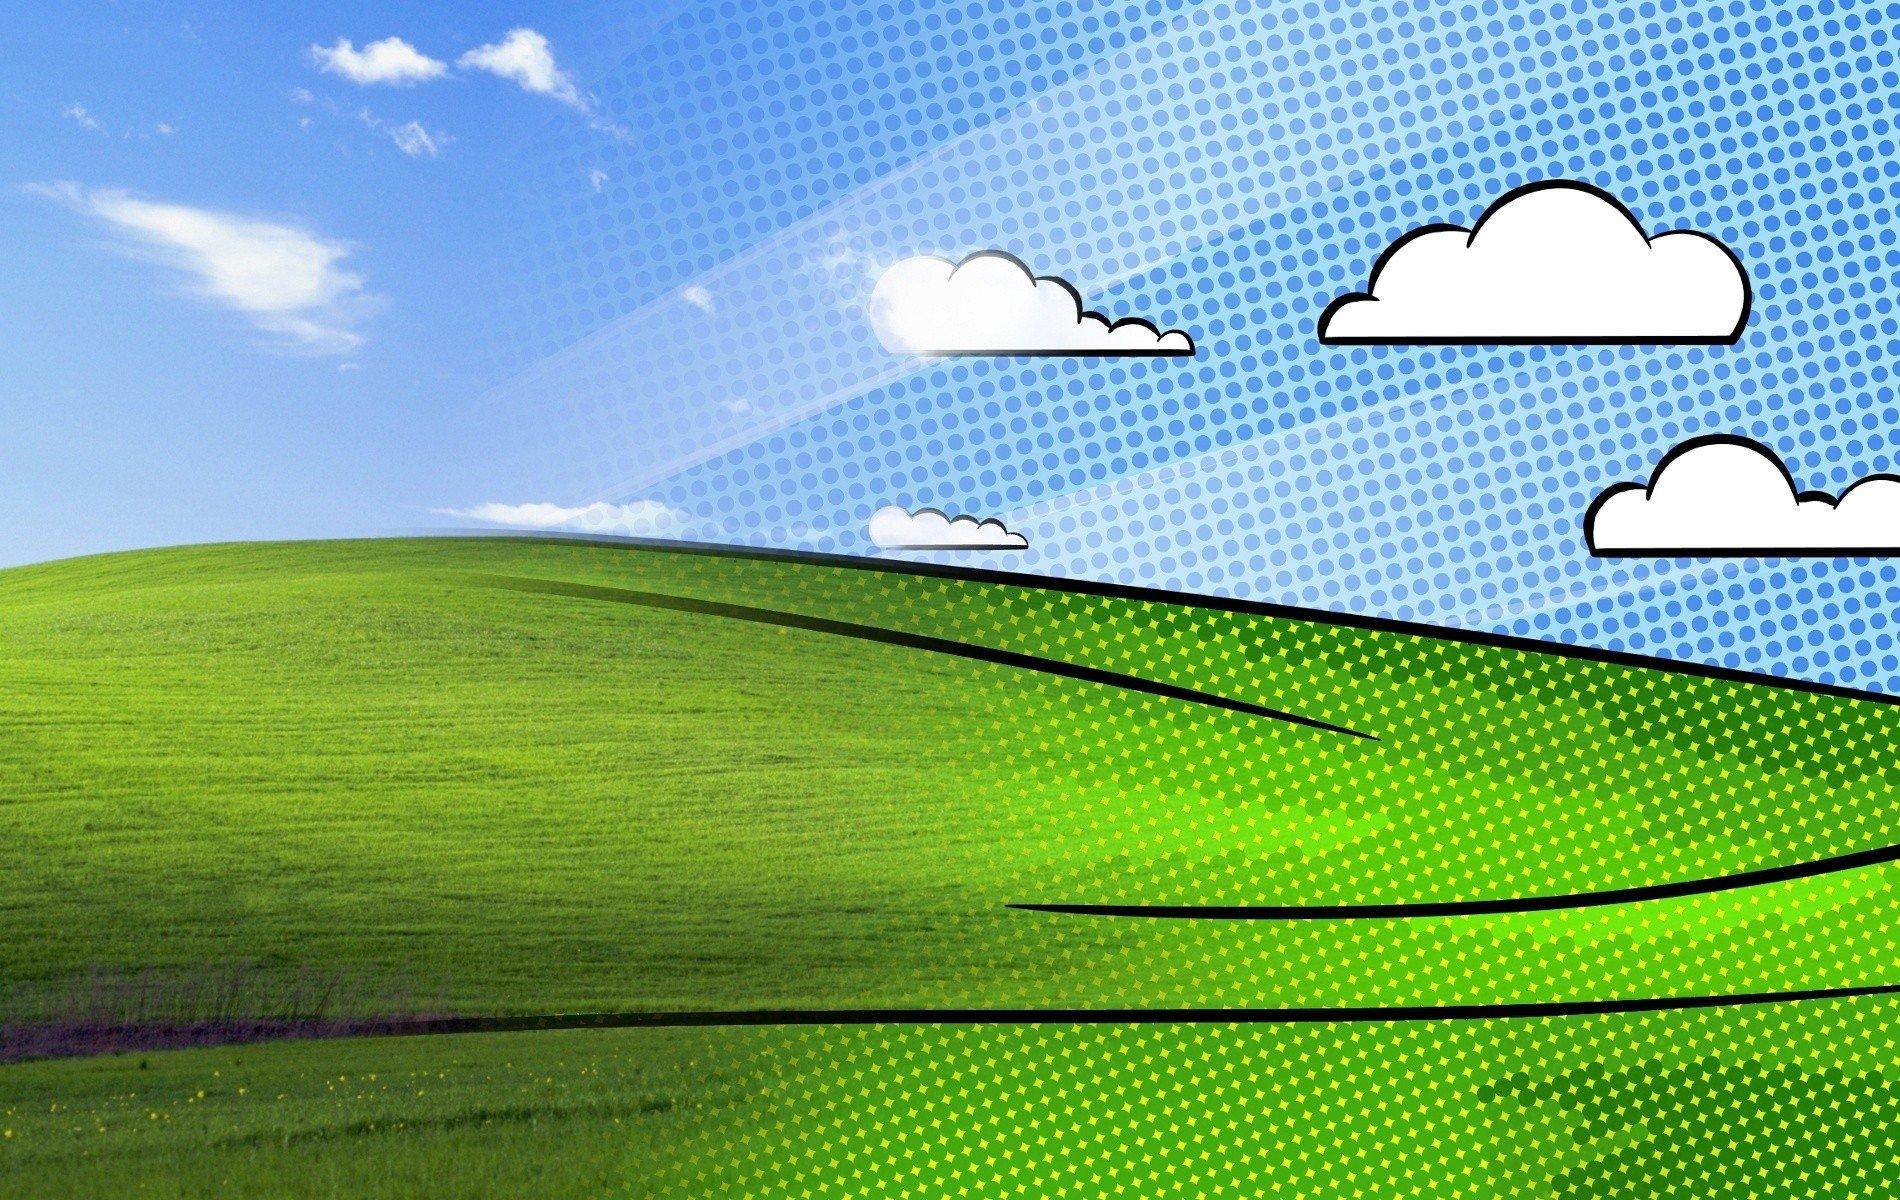 Free Download Bliss Windows Wallpaper 1900x1200 Bliss Windows Xp